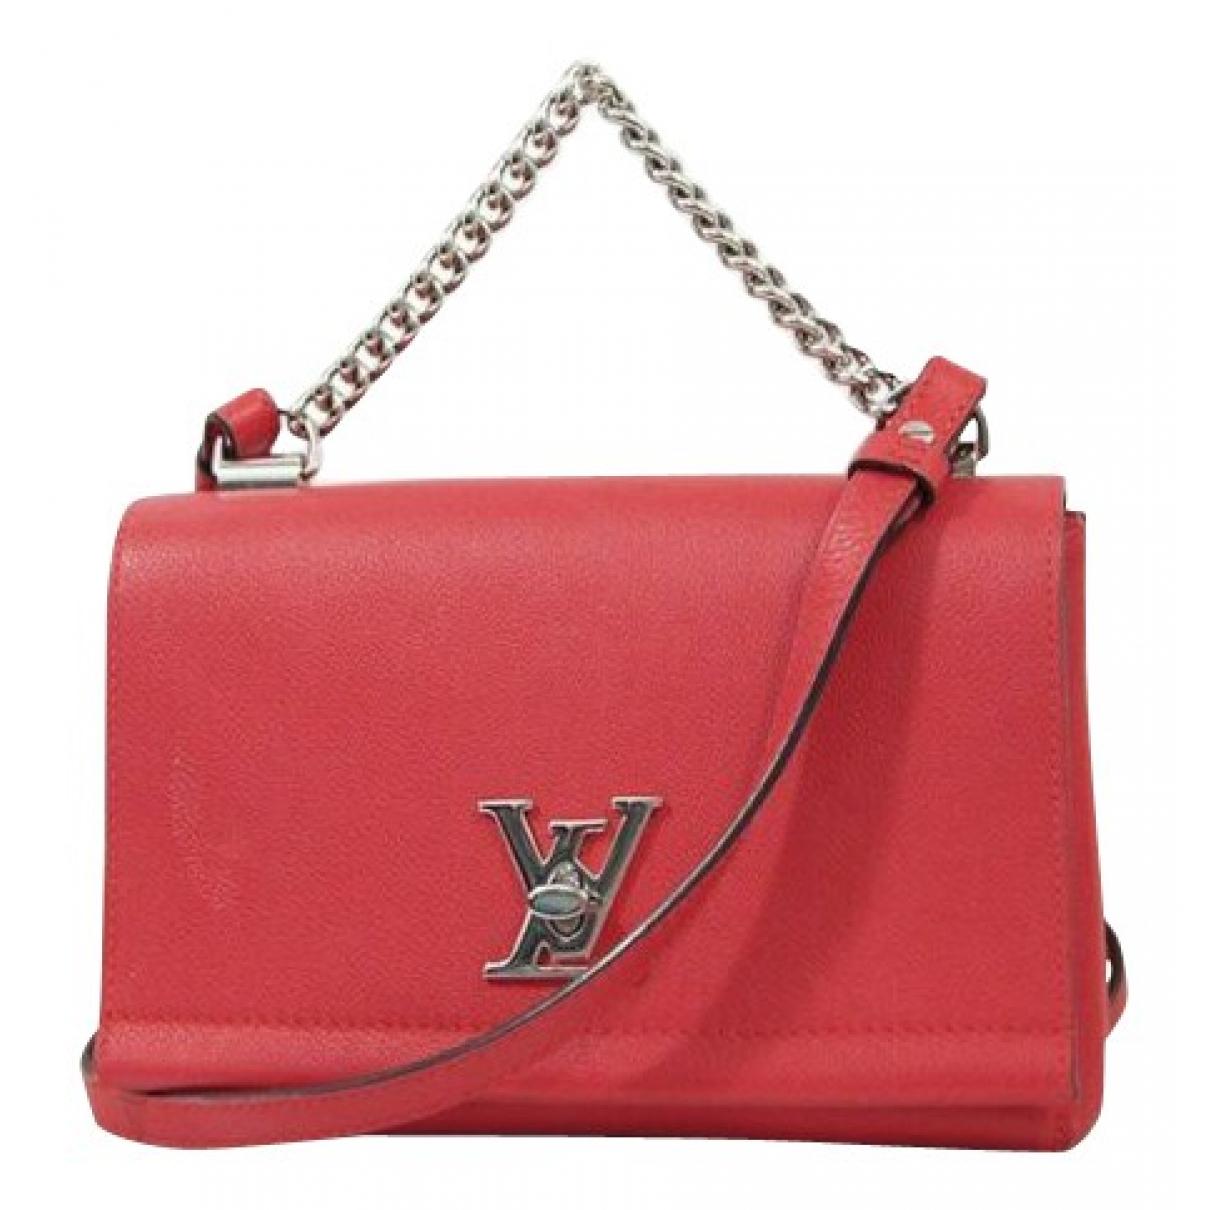 Louis Vuitton Lockme Red Leather handbag for Women \N